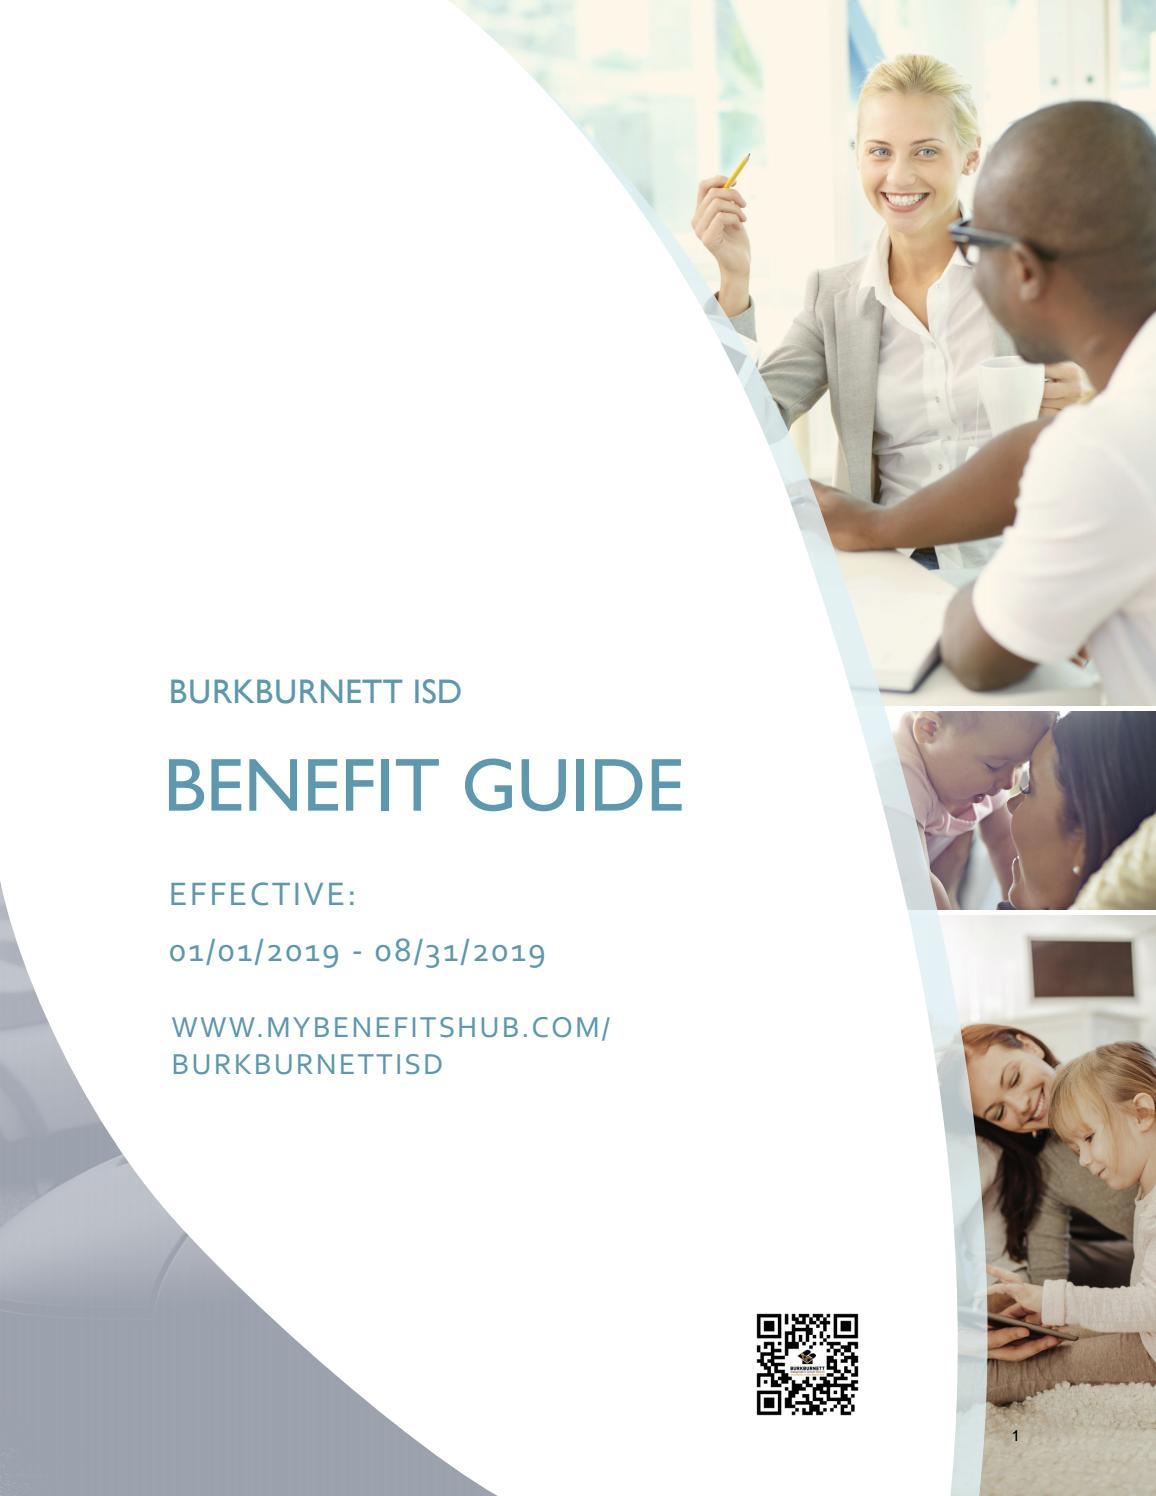 2019 Benefit Guide Burkburnett ISD by FBS - issuu